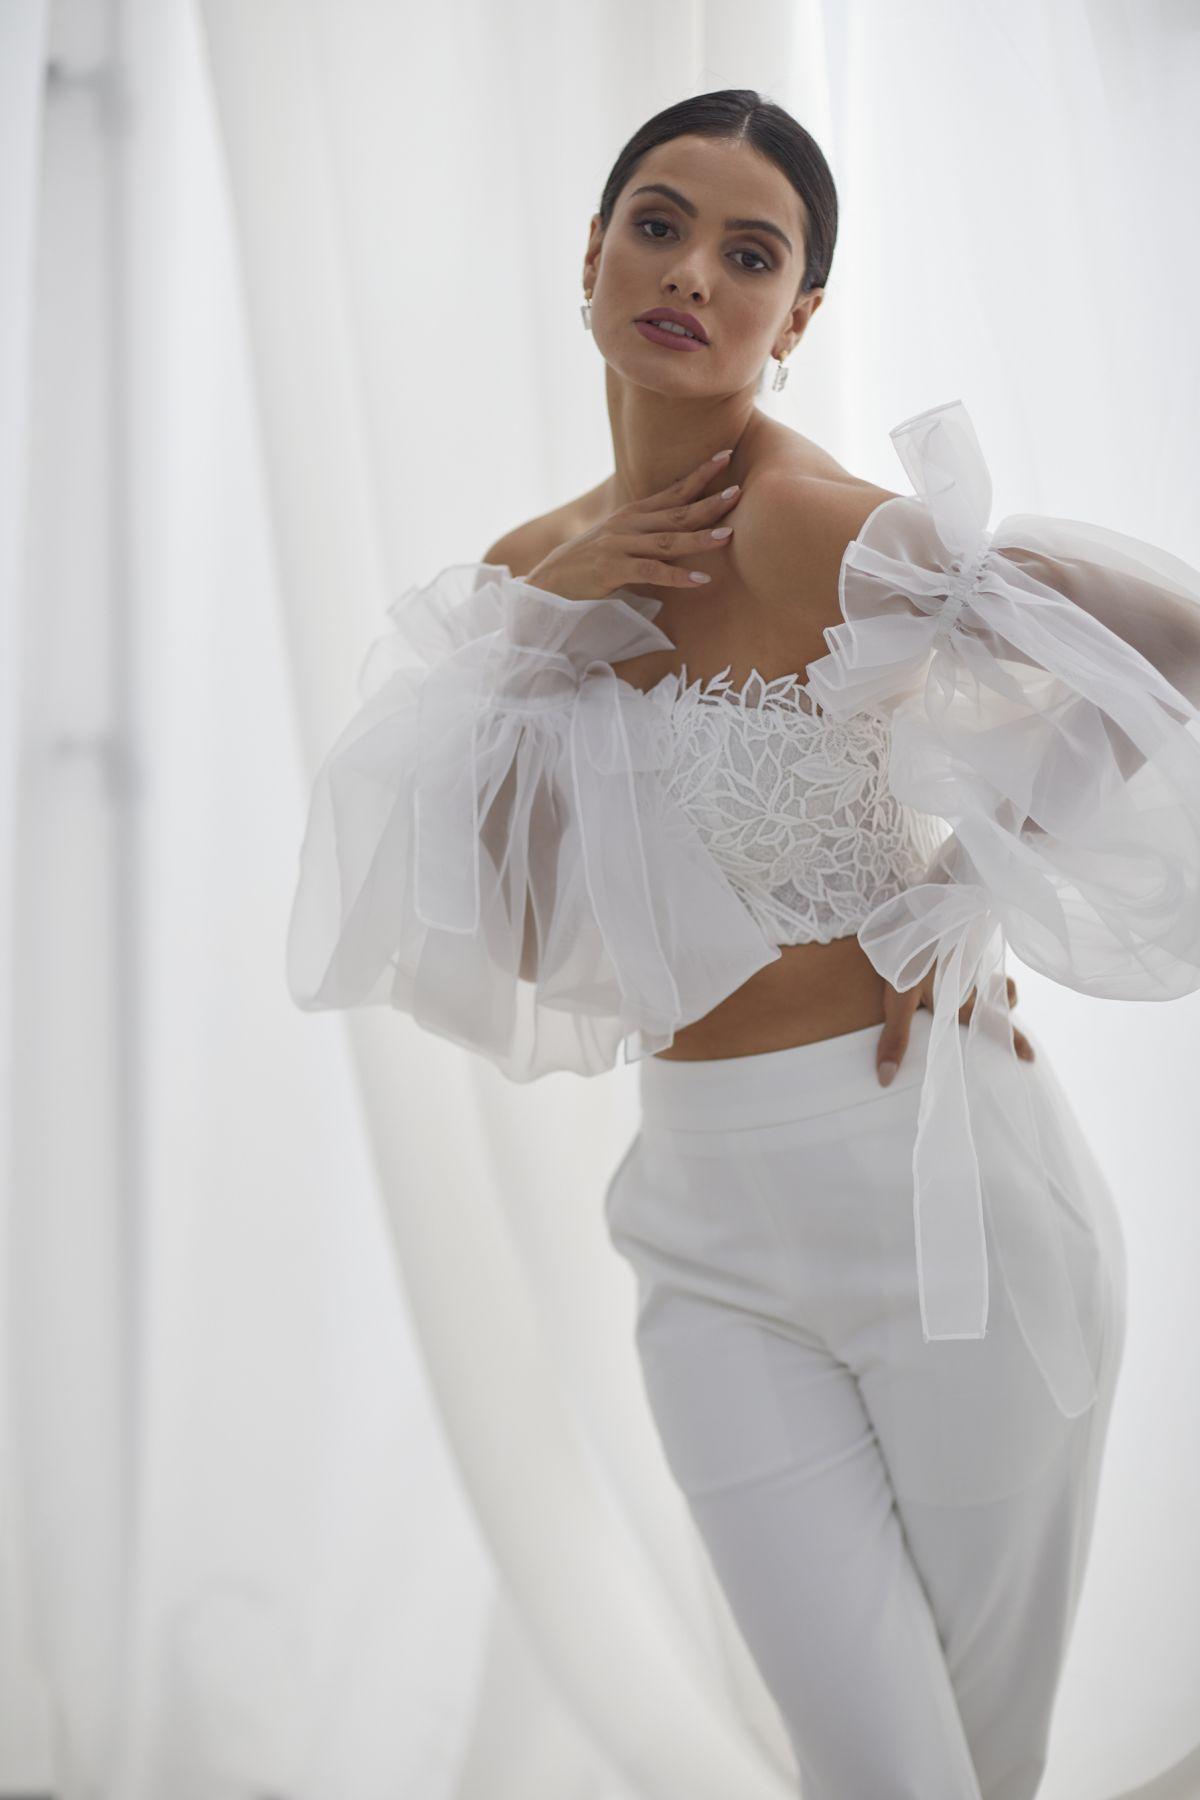 Autunno Sleeves Organza Wedding Gown 52_3660